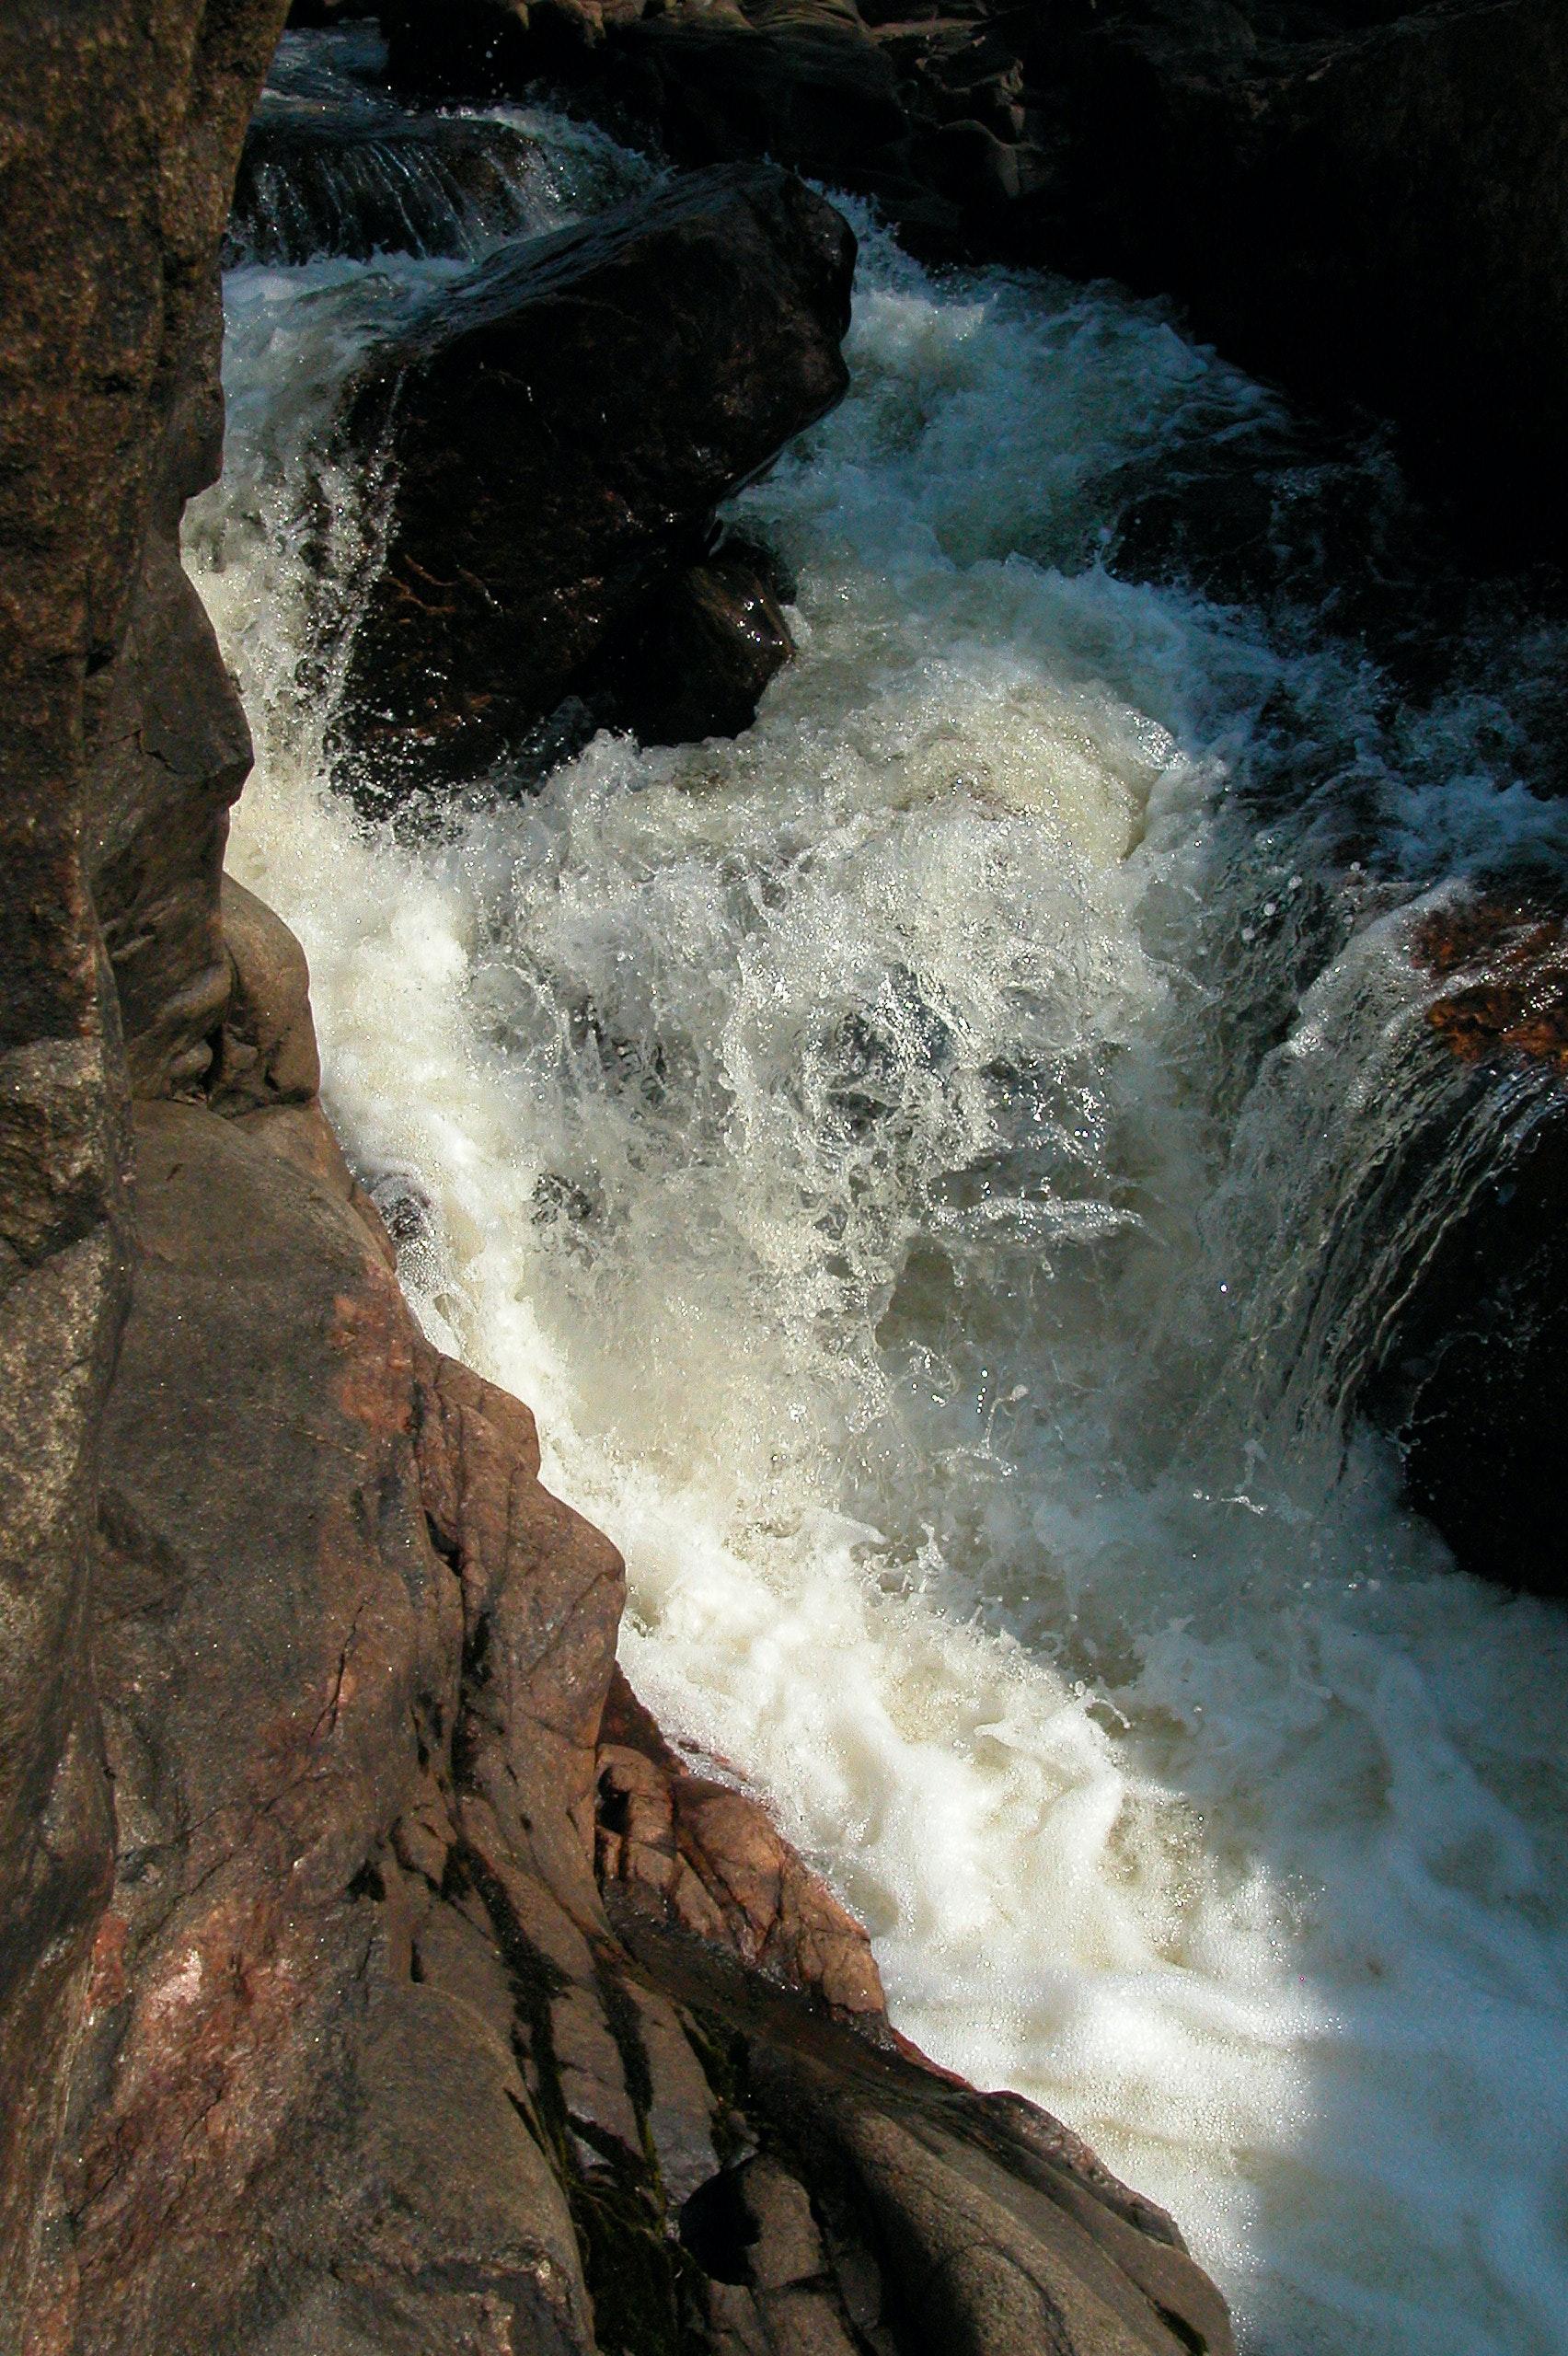 Free stock photo of northern ontario, rapids, river rocks